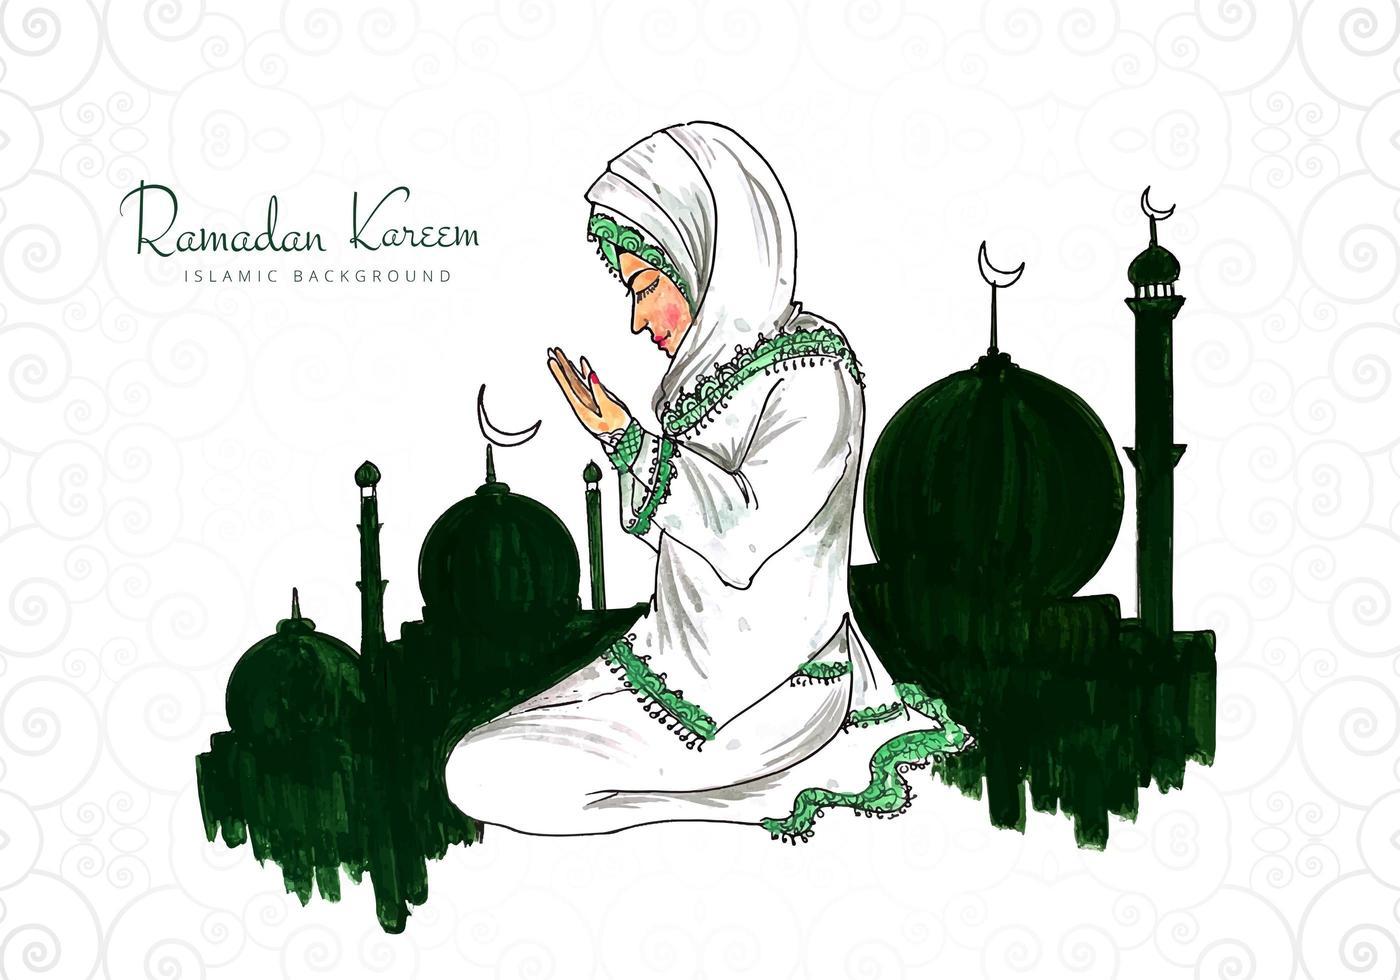 Ramadan Kareem Greeting with Woman Praying  vector